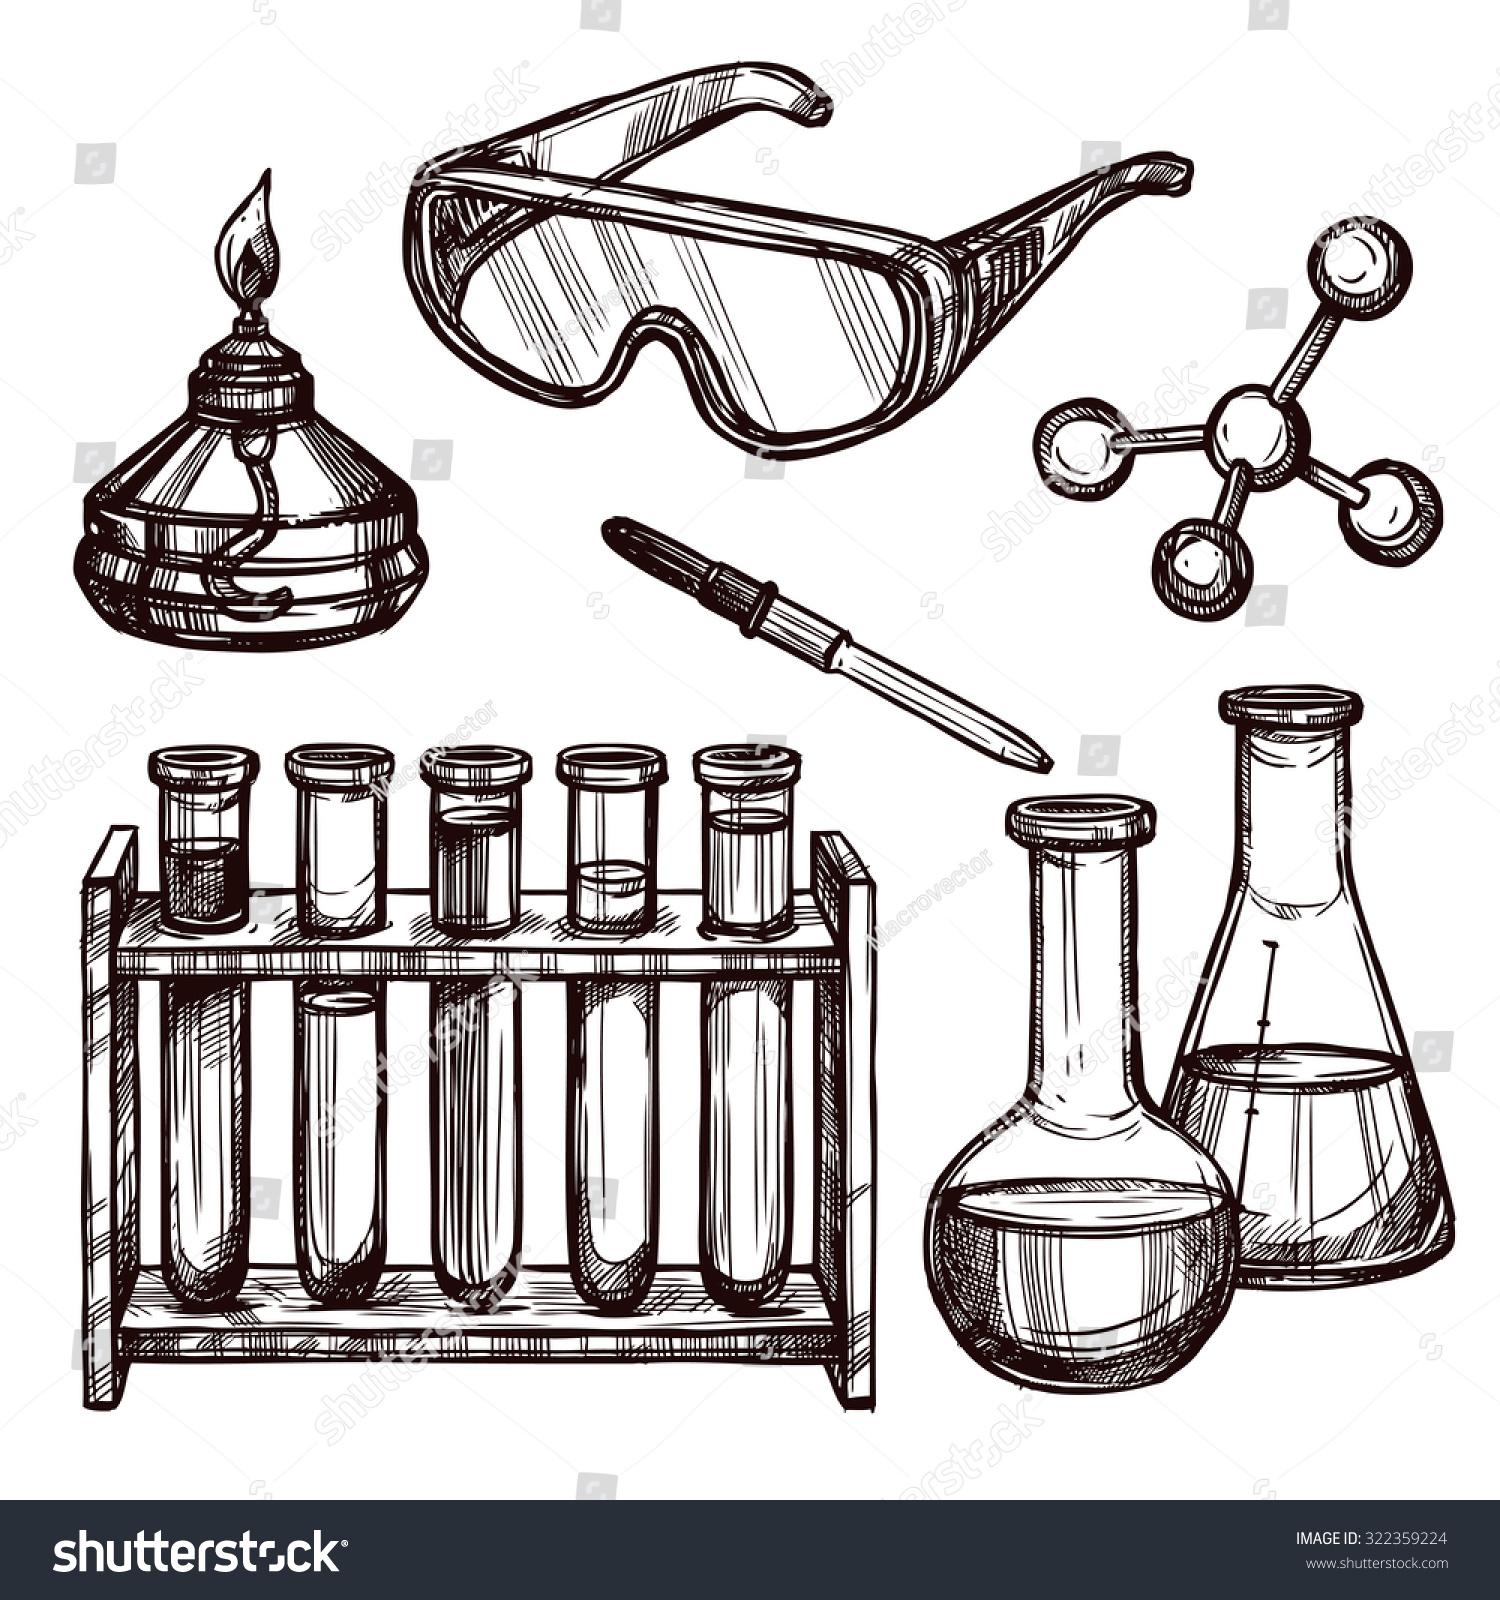 Chemistry Laboratory Tools Devices Black White Stock ...